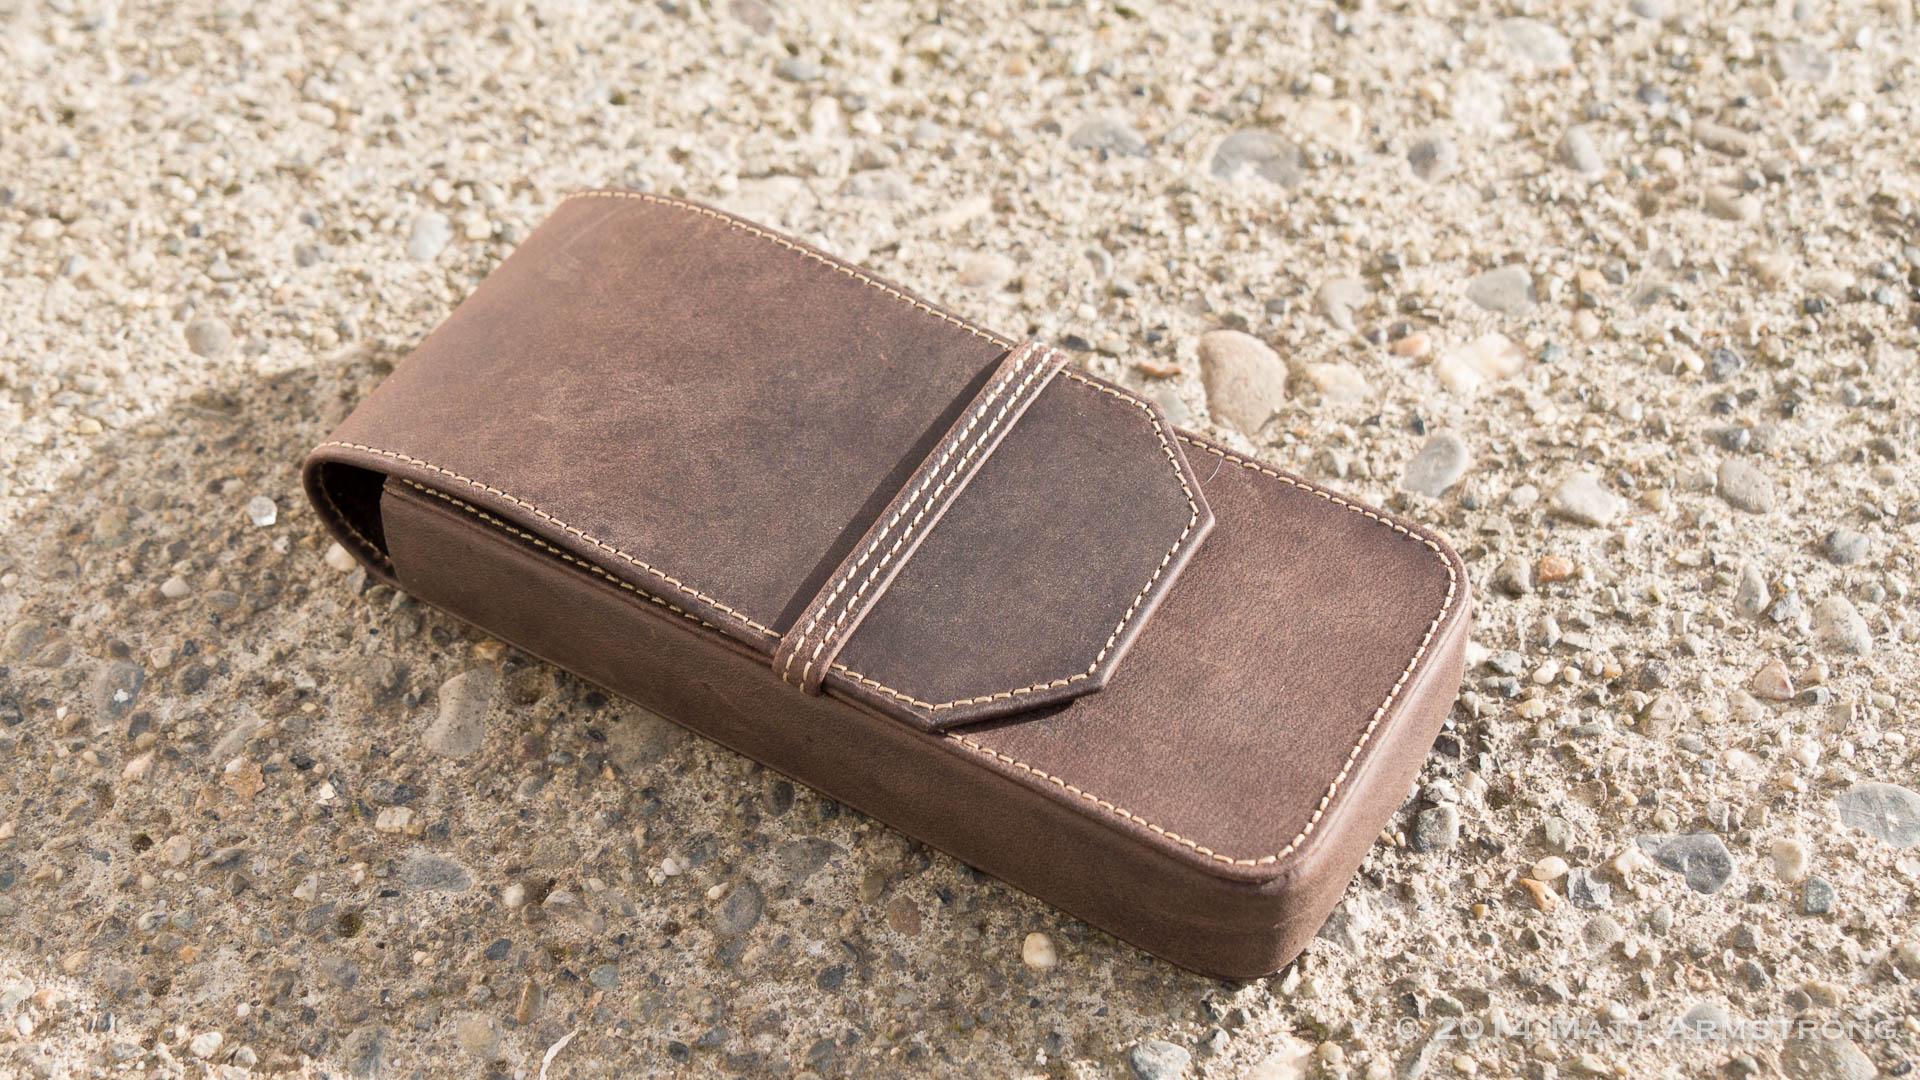 Pen-aphernalia: Franklin-Christoph 3-Pen Leather Pen Case